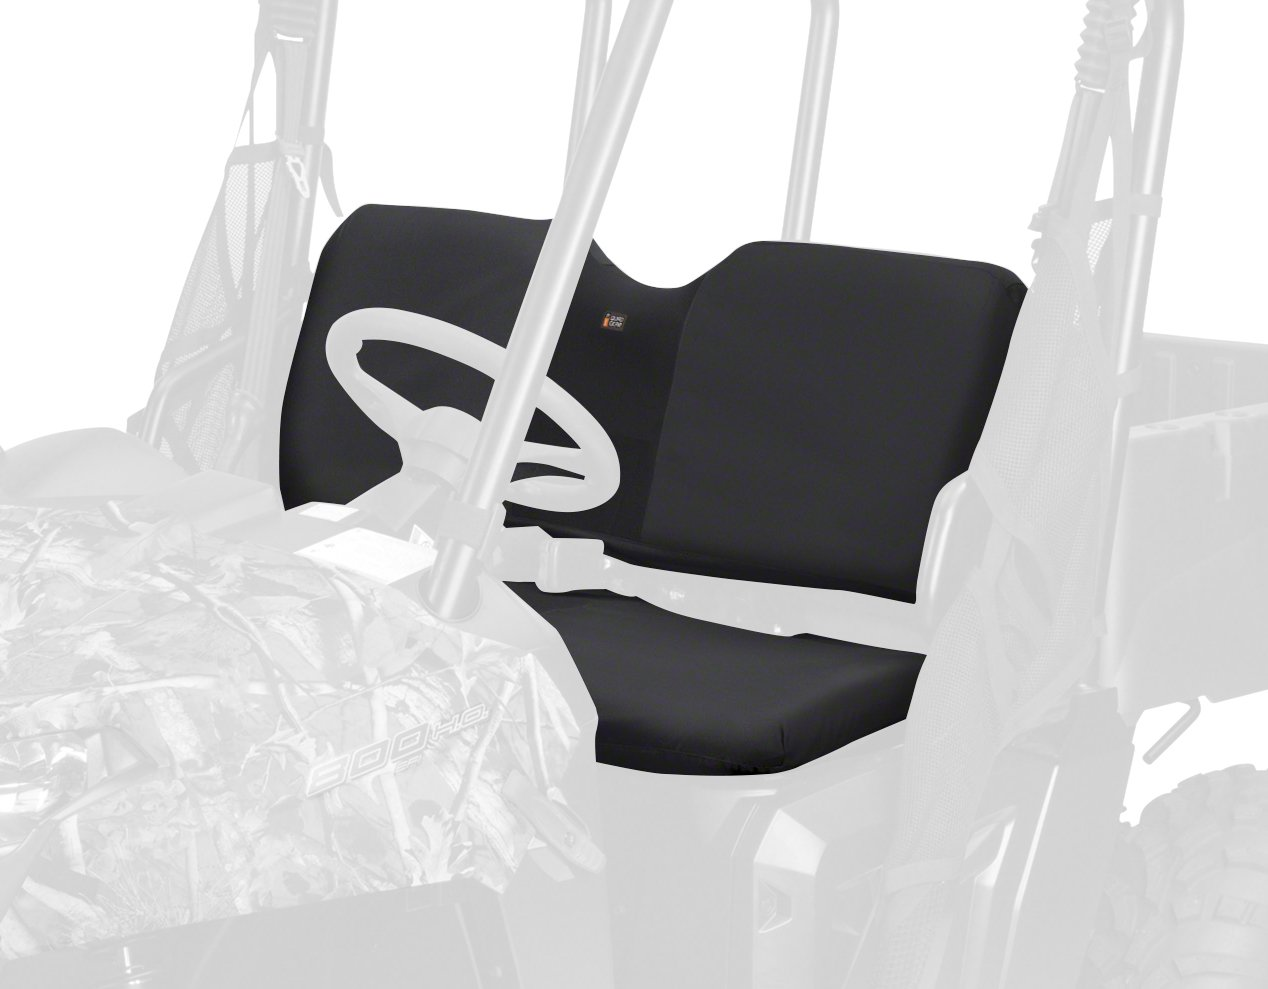 Classic Accessories Black UTV Bench Seat Cover - Four Wheeler Accessories for Polaris Ranger (18-158-010401-RT)